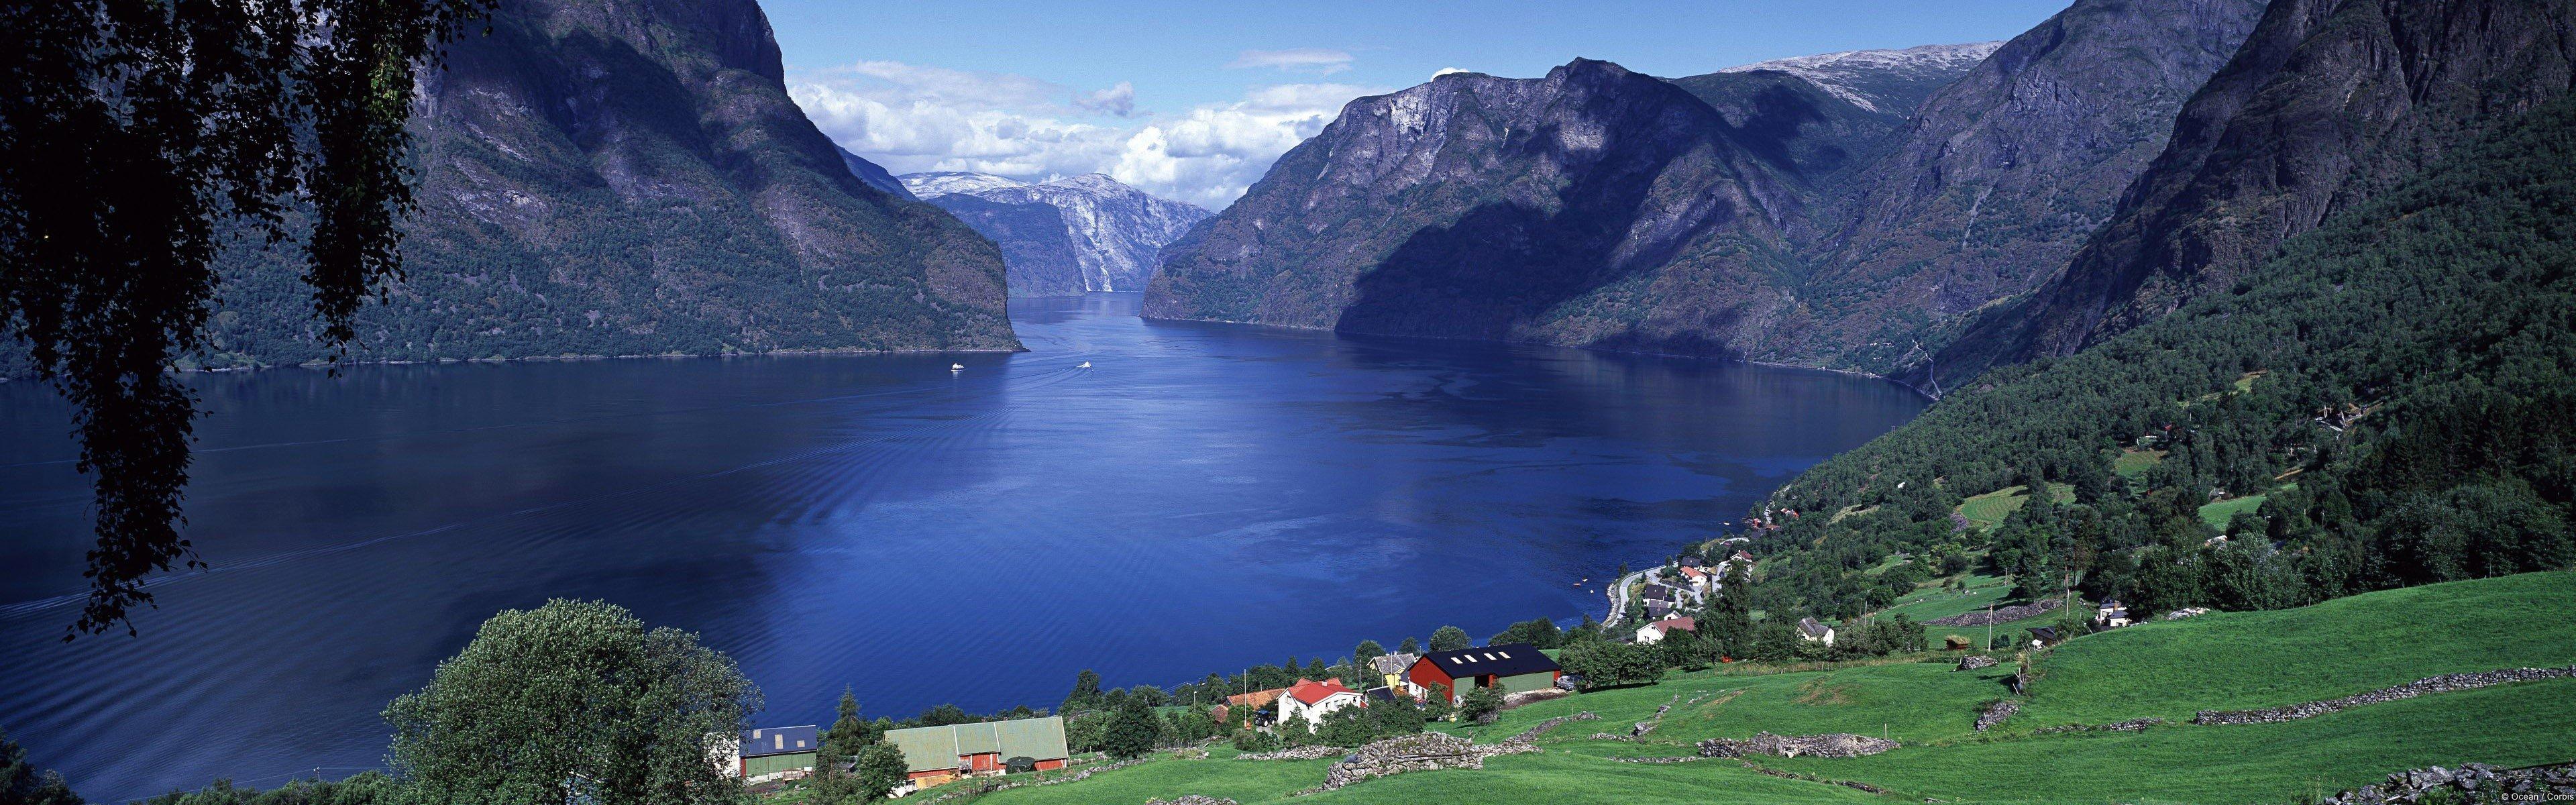 Aurlandsfjord In Norway Wallpaper 4k Ultra Hd Id1901